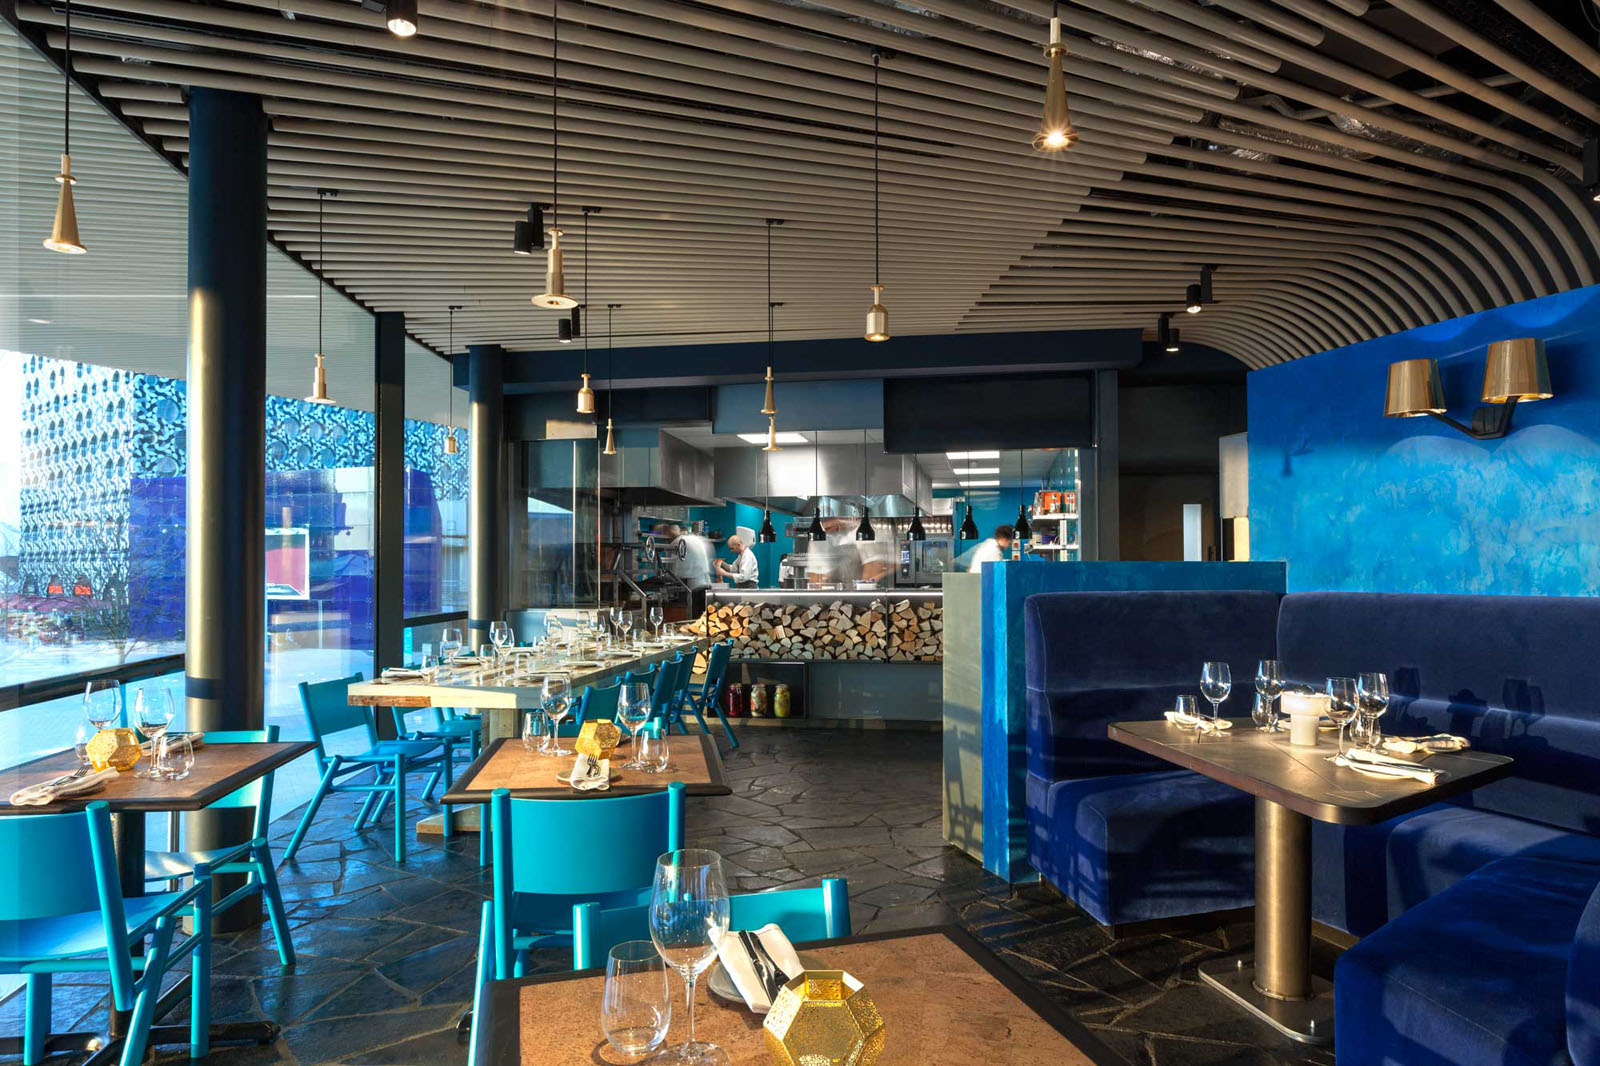 Craft London Restaurant By Tom Dixon  iDesignArch  Interior Design Architecture  Interior